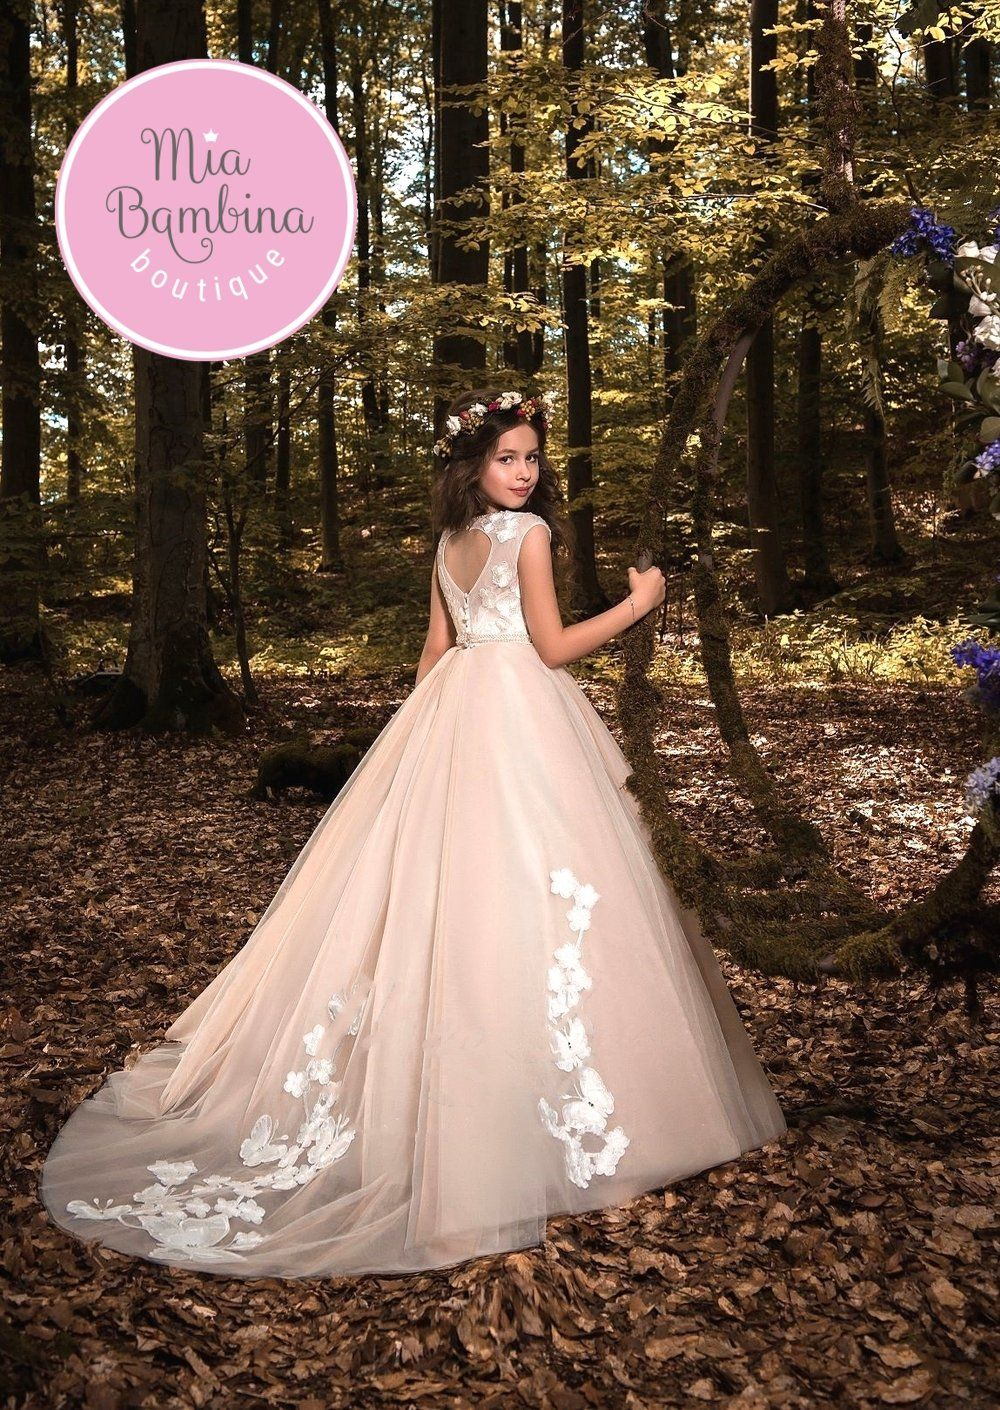 Atlanta wedding dress shops  Palencia  Vintage party dresses  Pinterest  Flower girl dresses